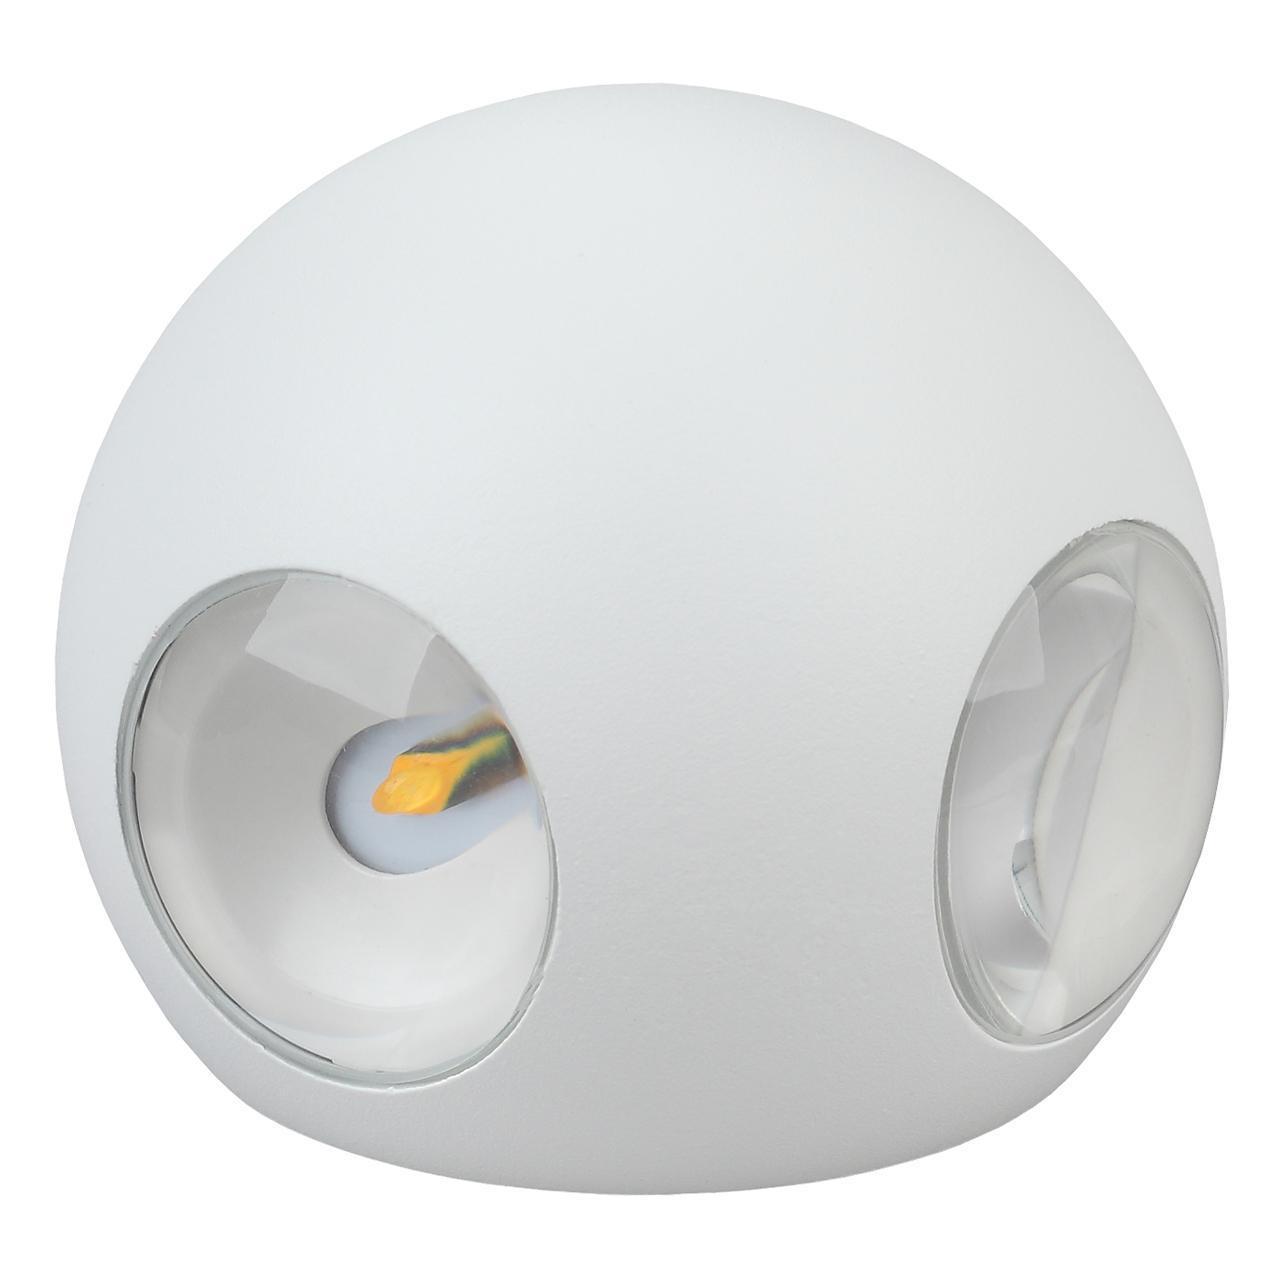 цена на Уличный светильник Эра WL10 WH, LED